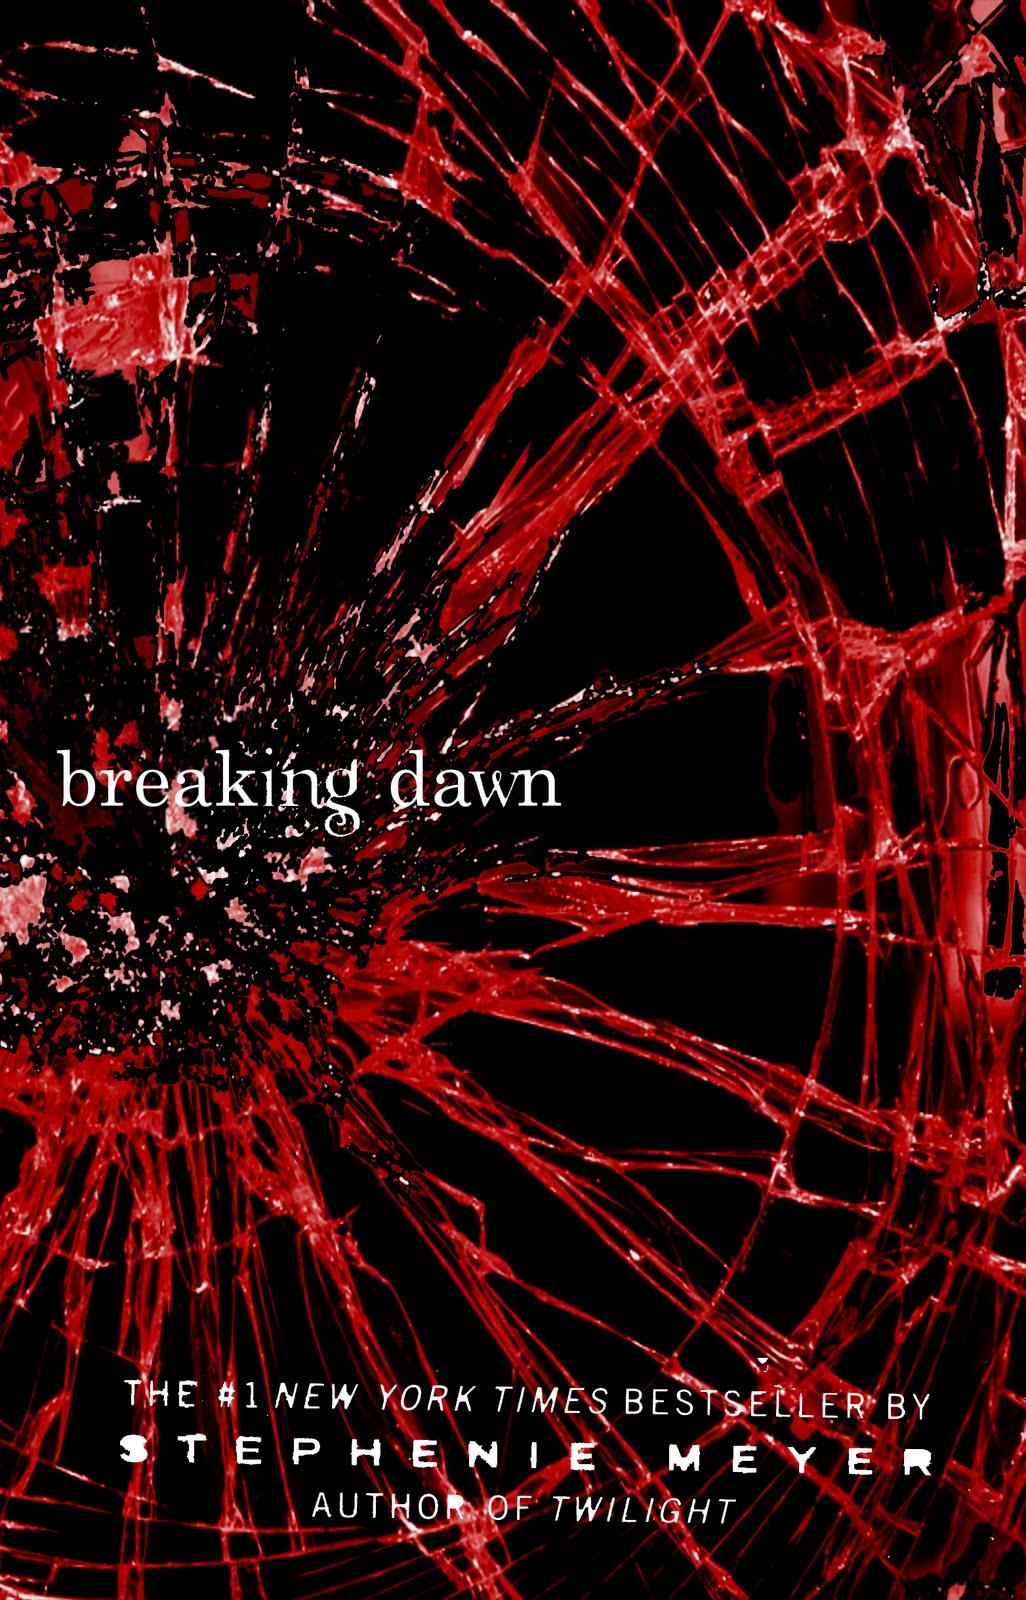 stephenckane: Rami Malek sings for The Twilight Saga Breaking Down ...